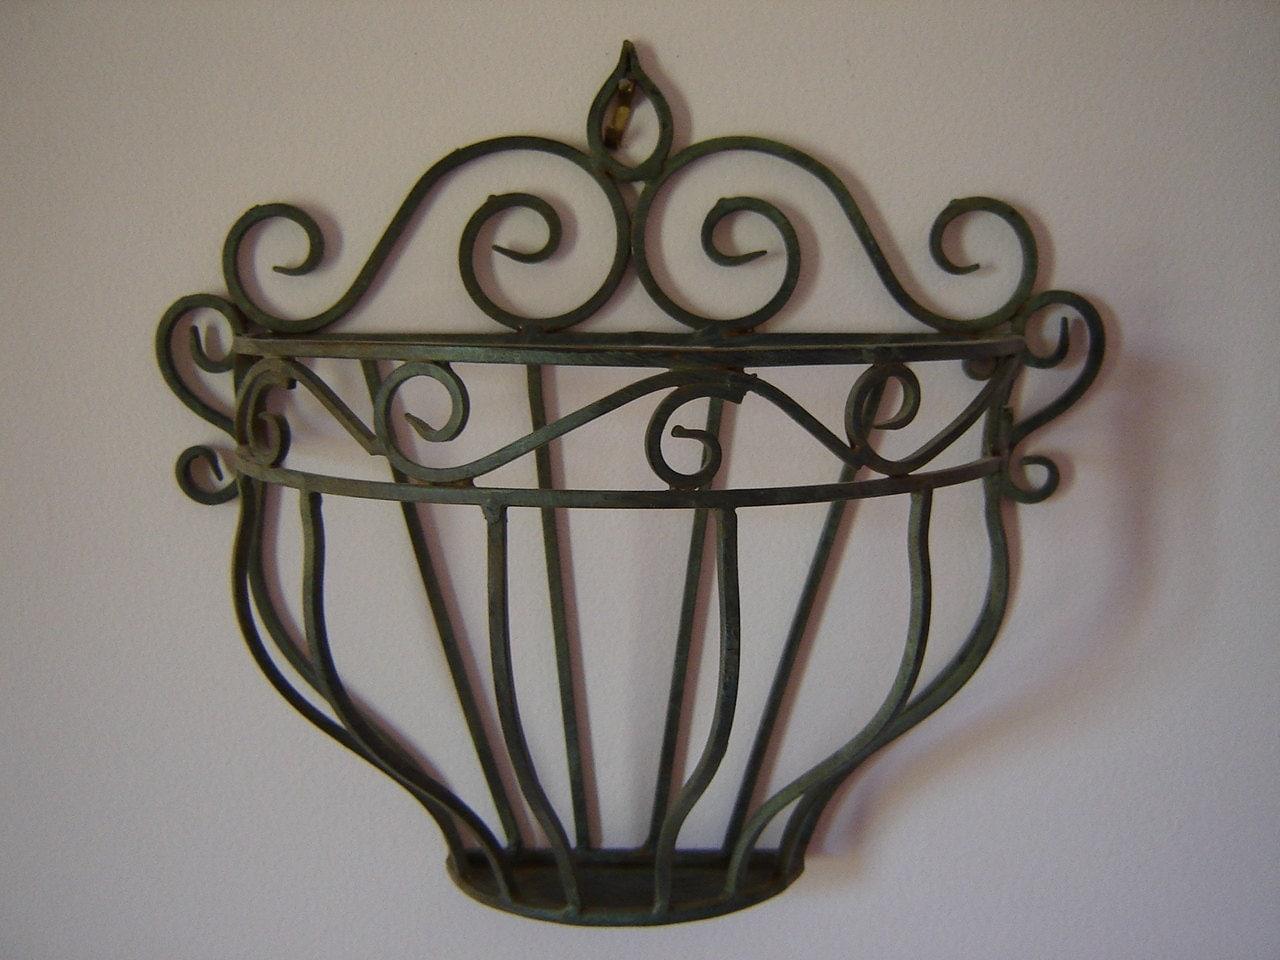 Wrought Iron Wall Pocket/ Ornate Iron Decor/ Garden Decor/